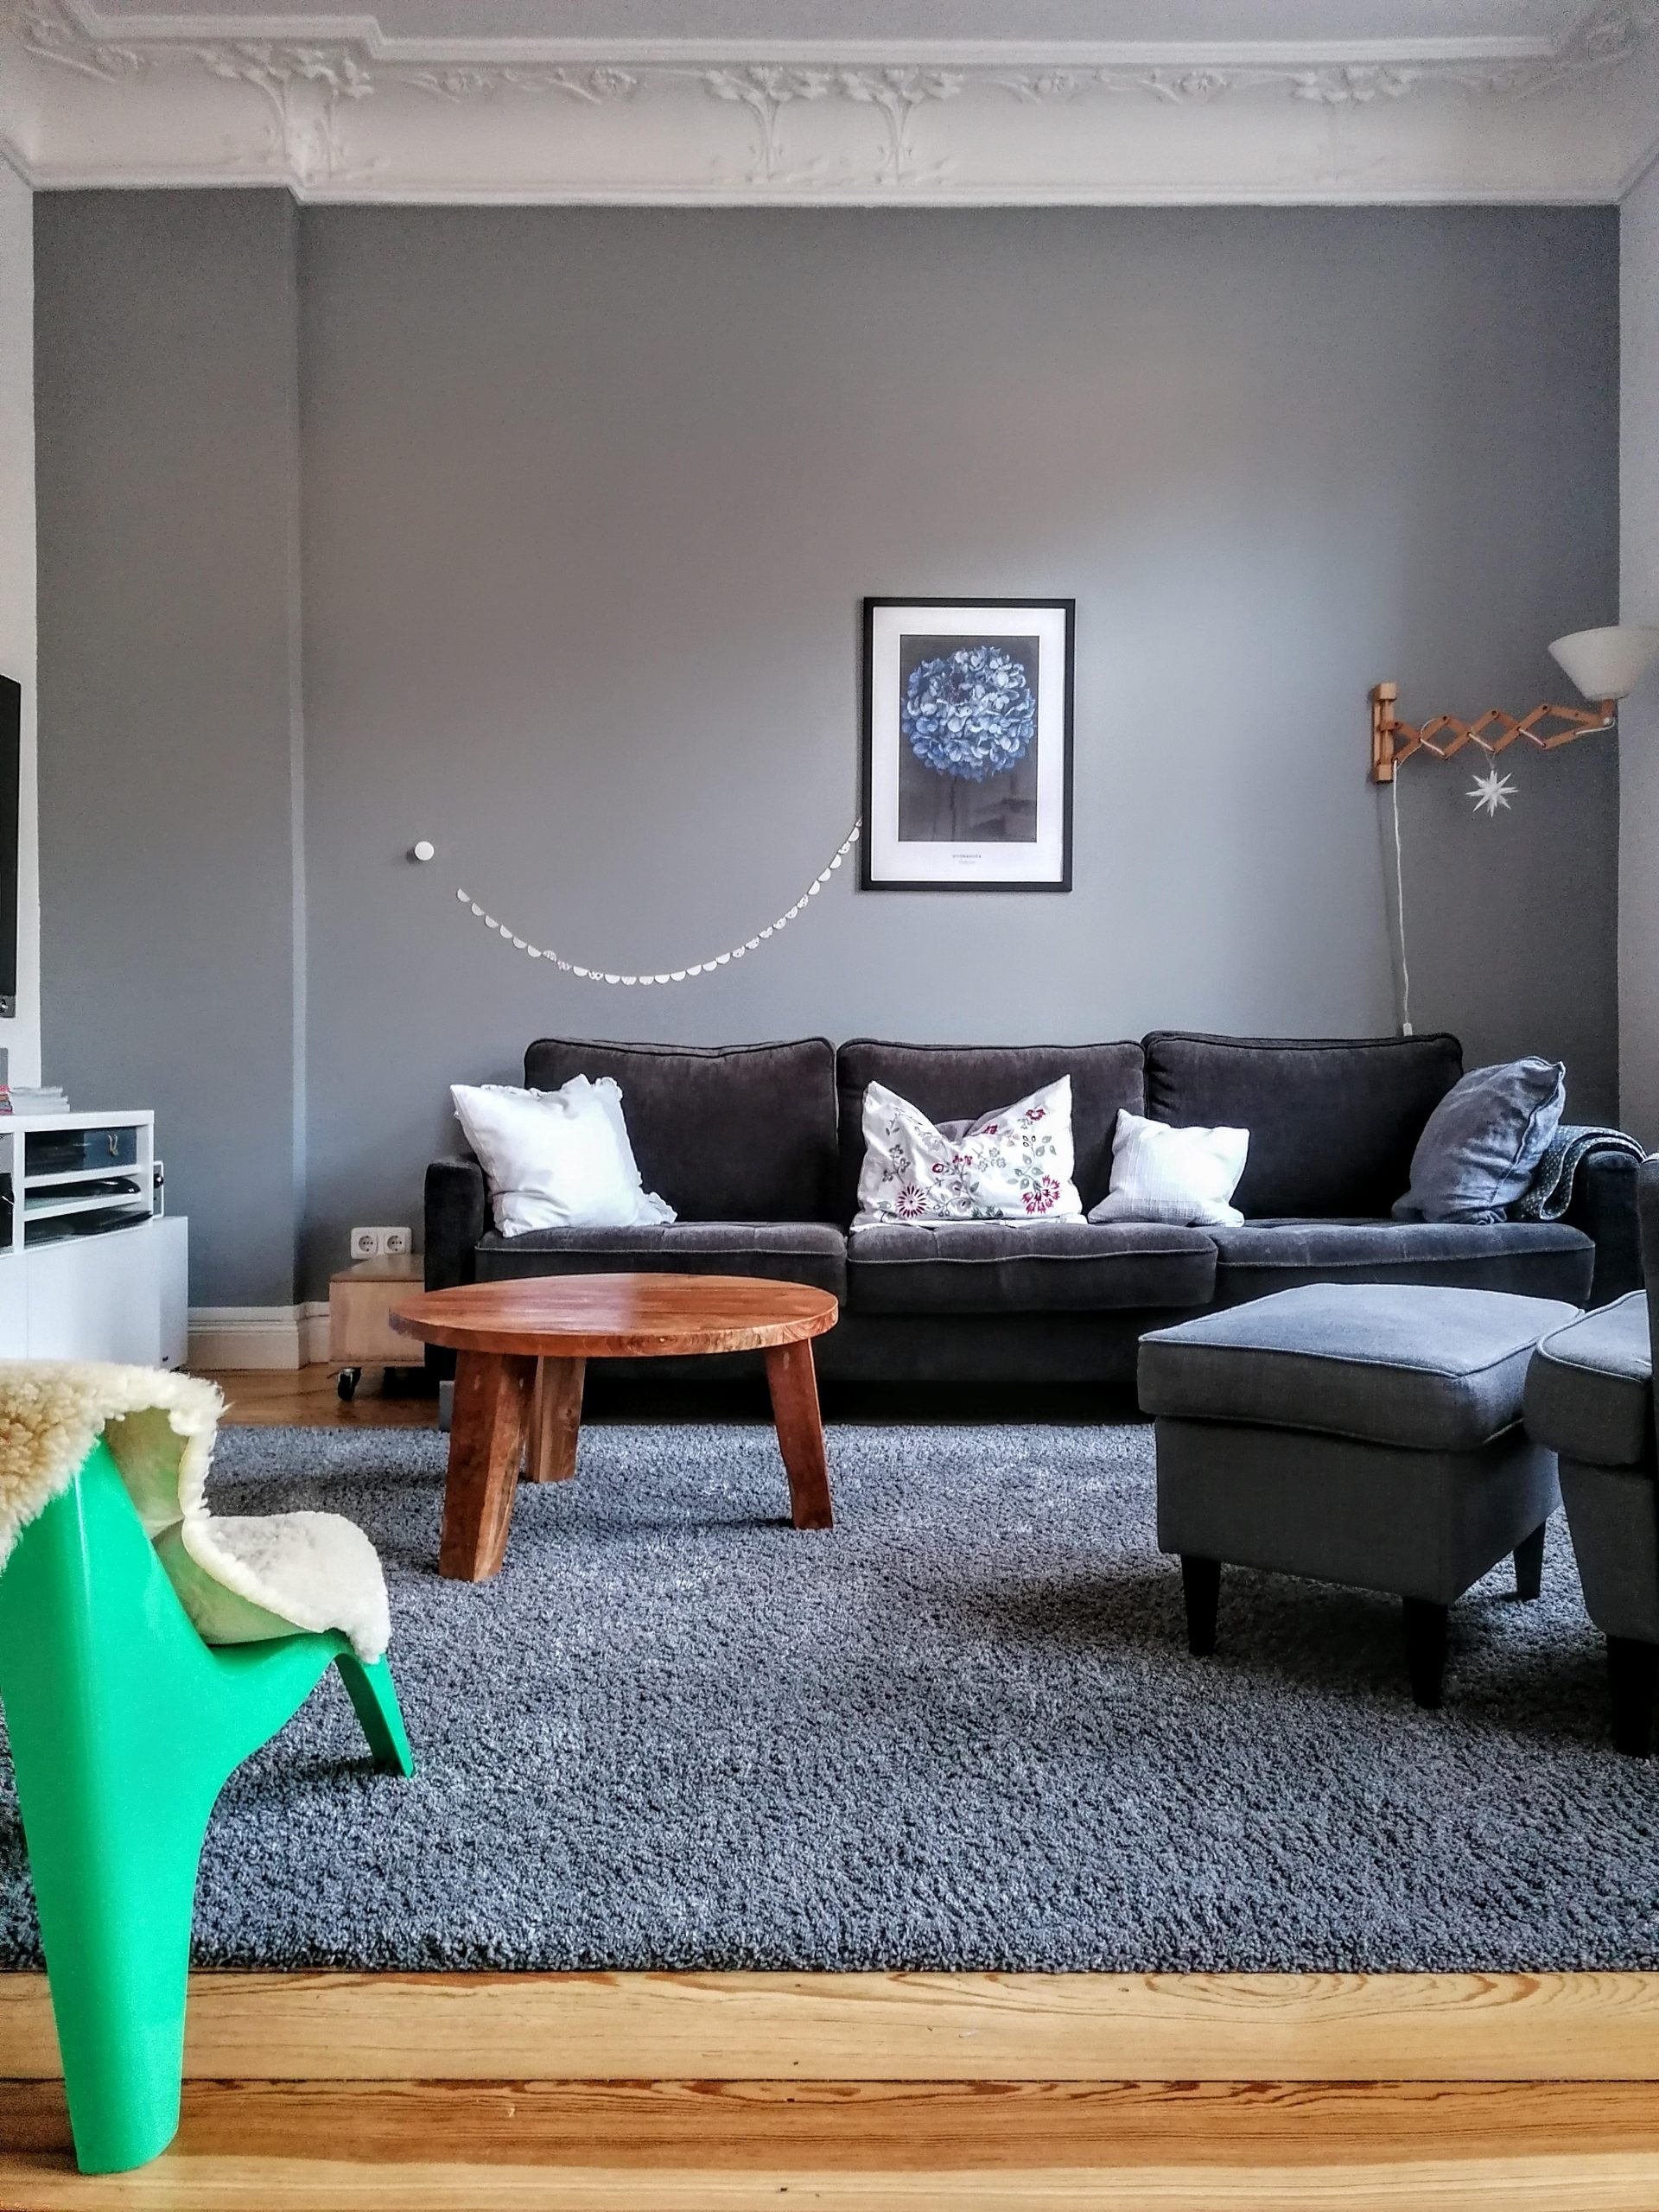 Full Size of Wohnzimmer Ideen Grau Graue Wand Bilder Couch Liege Graues Sofa Sessel Modern Küche Hochglanz Deckenleuchte Landhausstil Teppich Esstisch Deko Großes Bild Wohnzimmer Wohnzimmer Ideen Grau